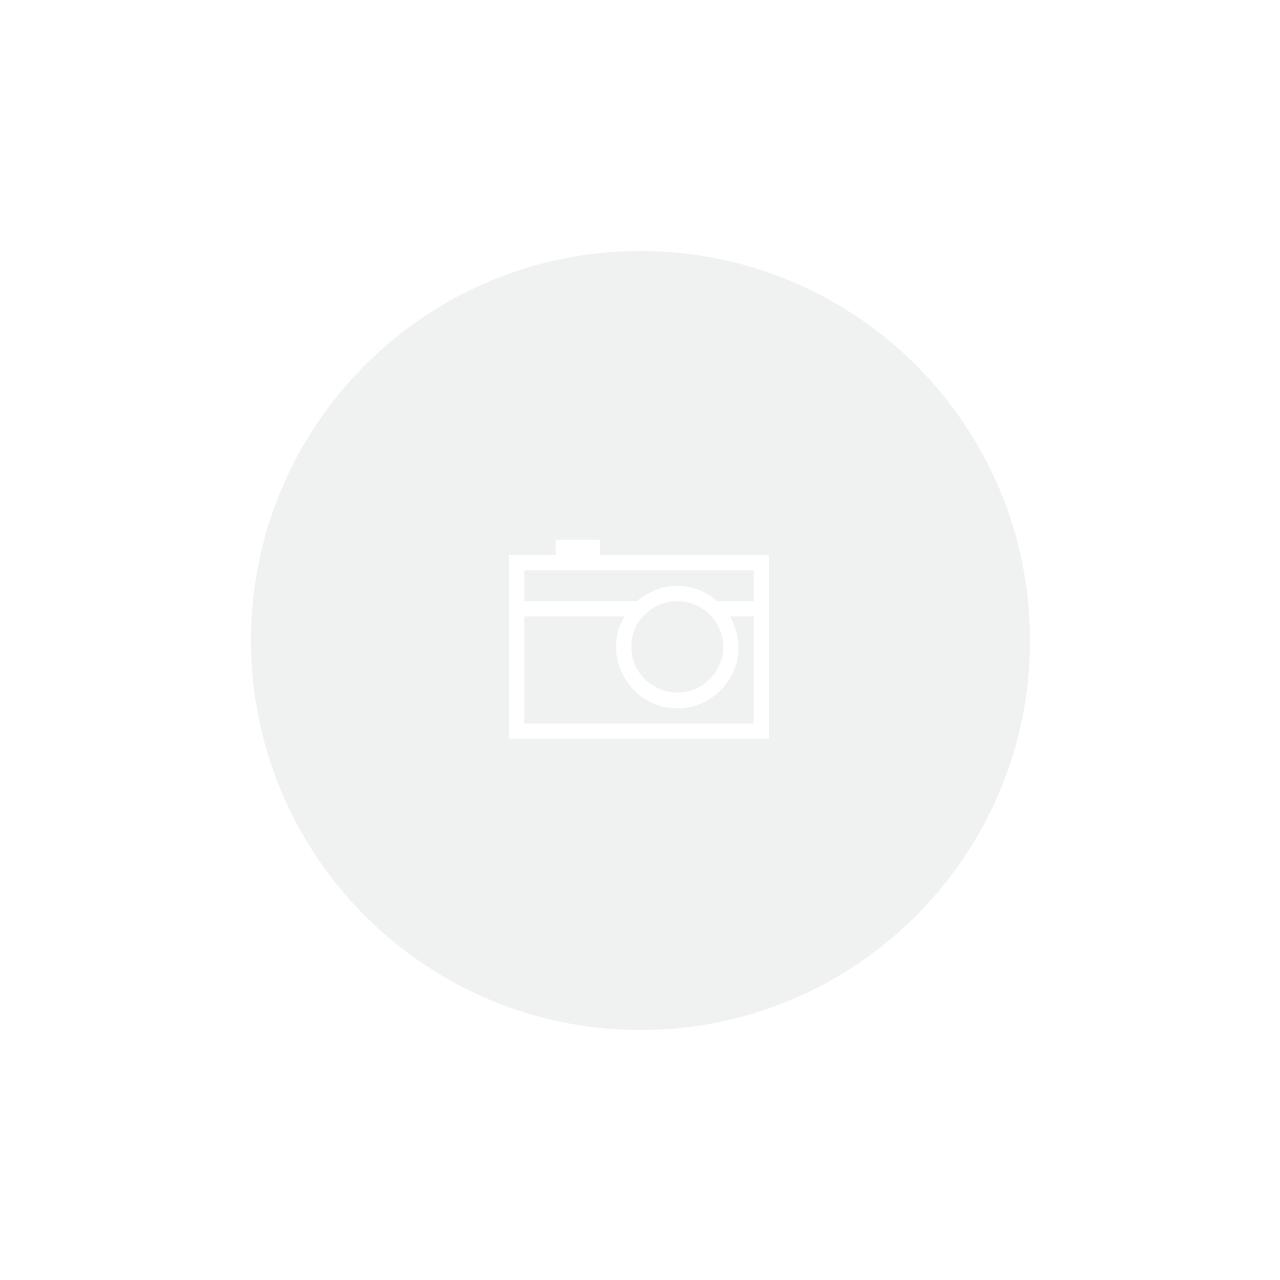 Mix Grill Redondo com Alça 37,7 cm Tramontina